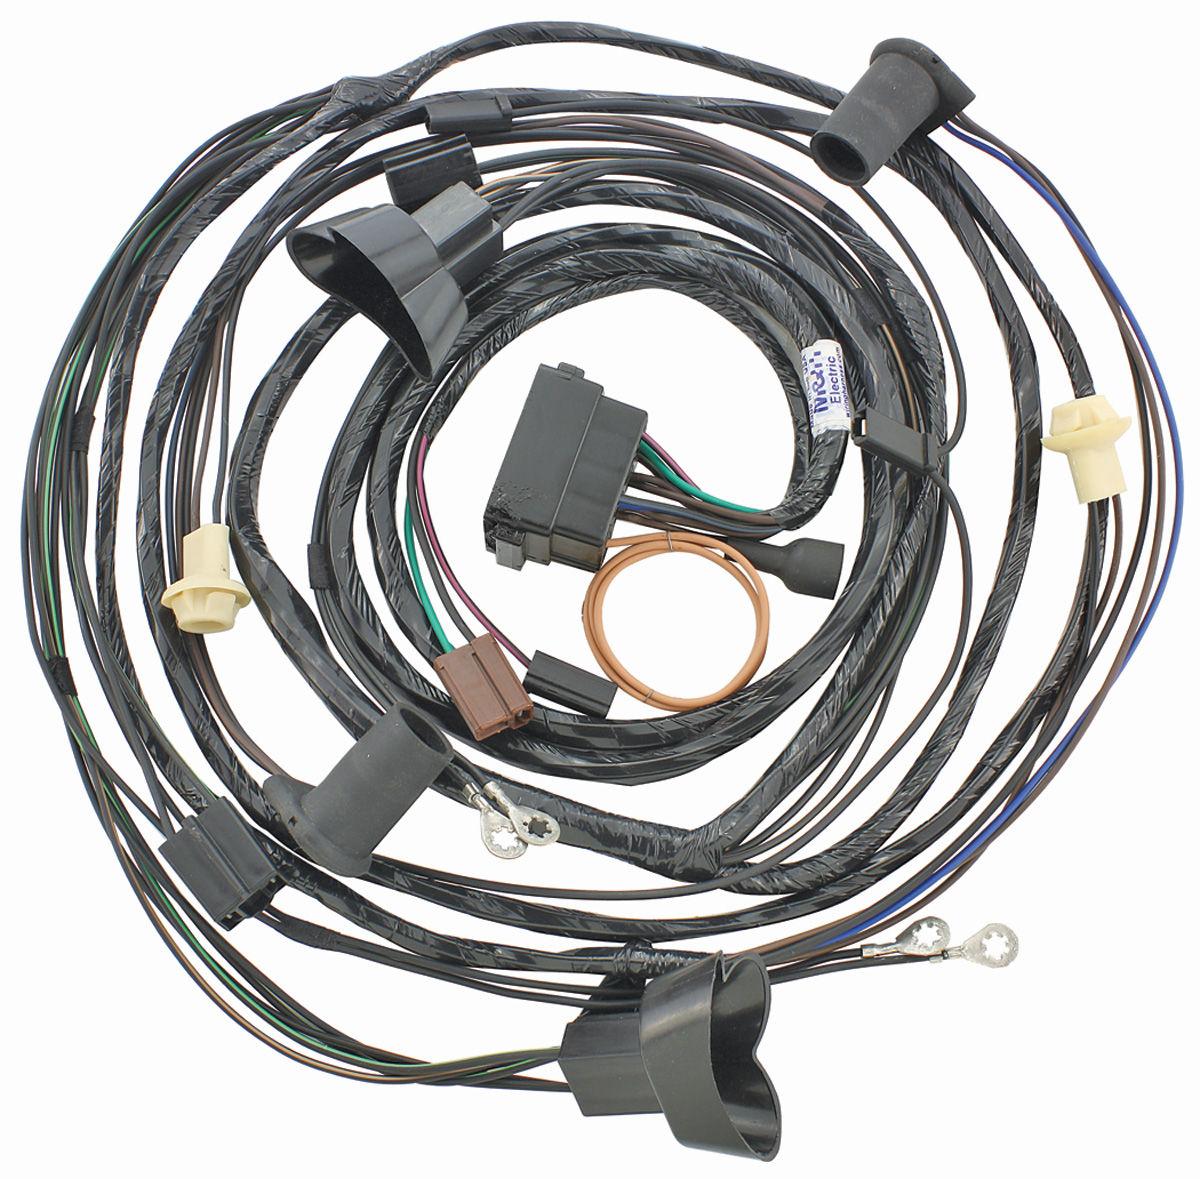 1970 gto wiring harness m&h 1970 forward lamp harness gto @ opgi.com #8